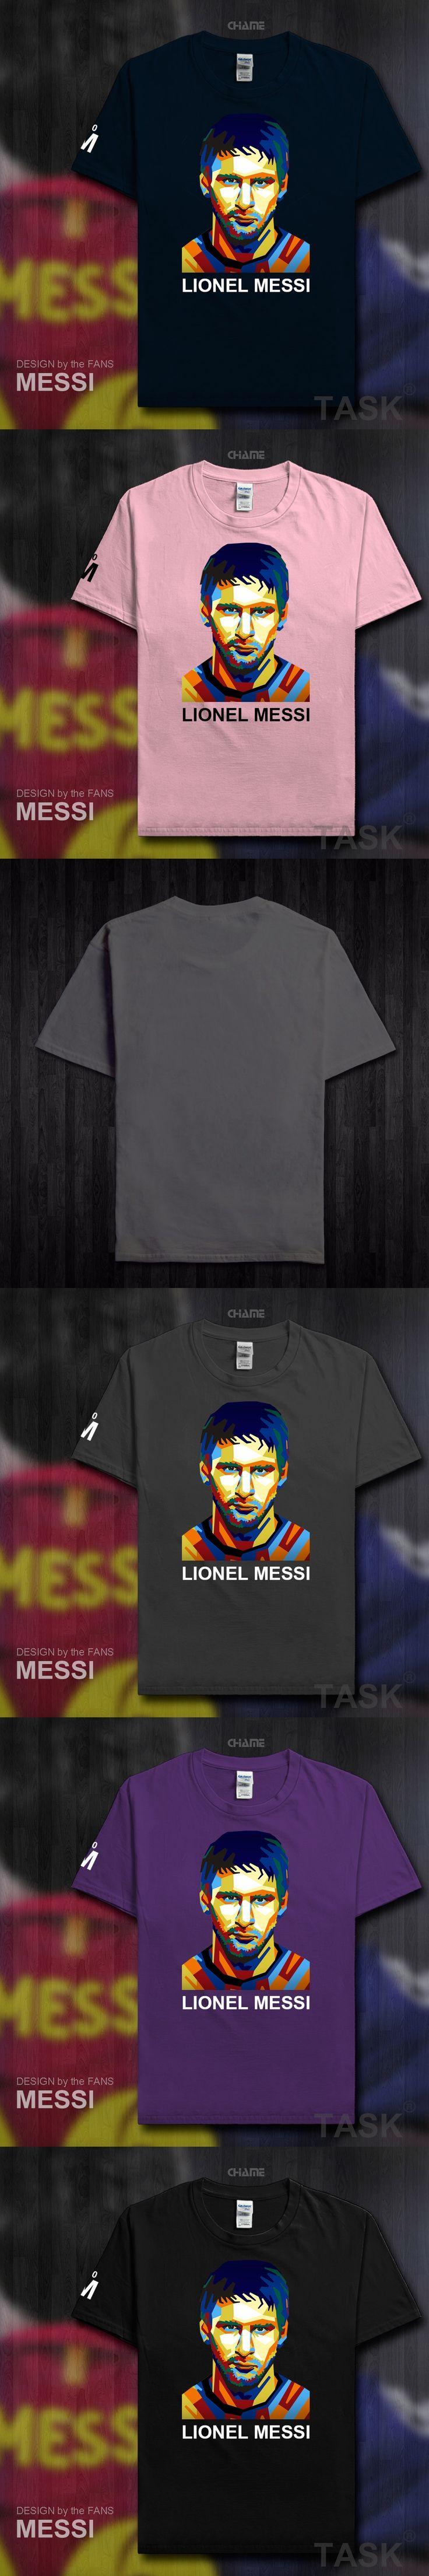 2017 New Summer Men's T-shirt MESSI Barcelona Printing T Shirts Casual Tops Tee Boys Fans Shirt Argentina footballer star M10 04